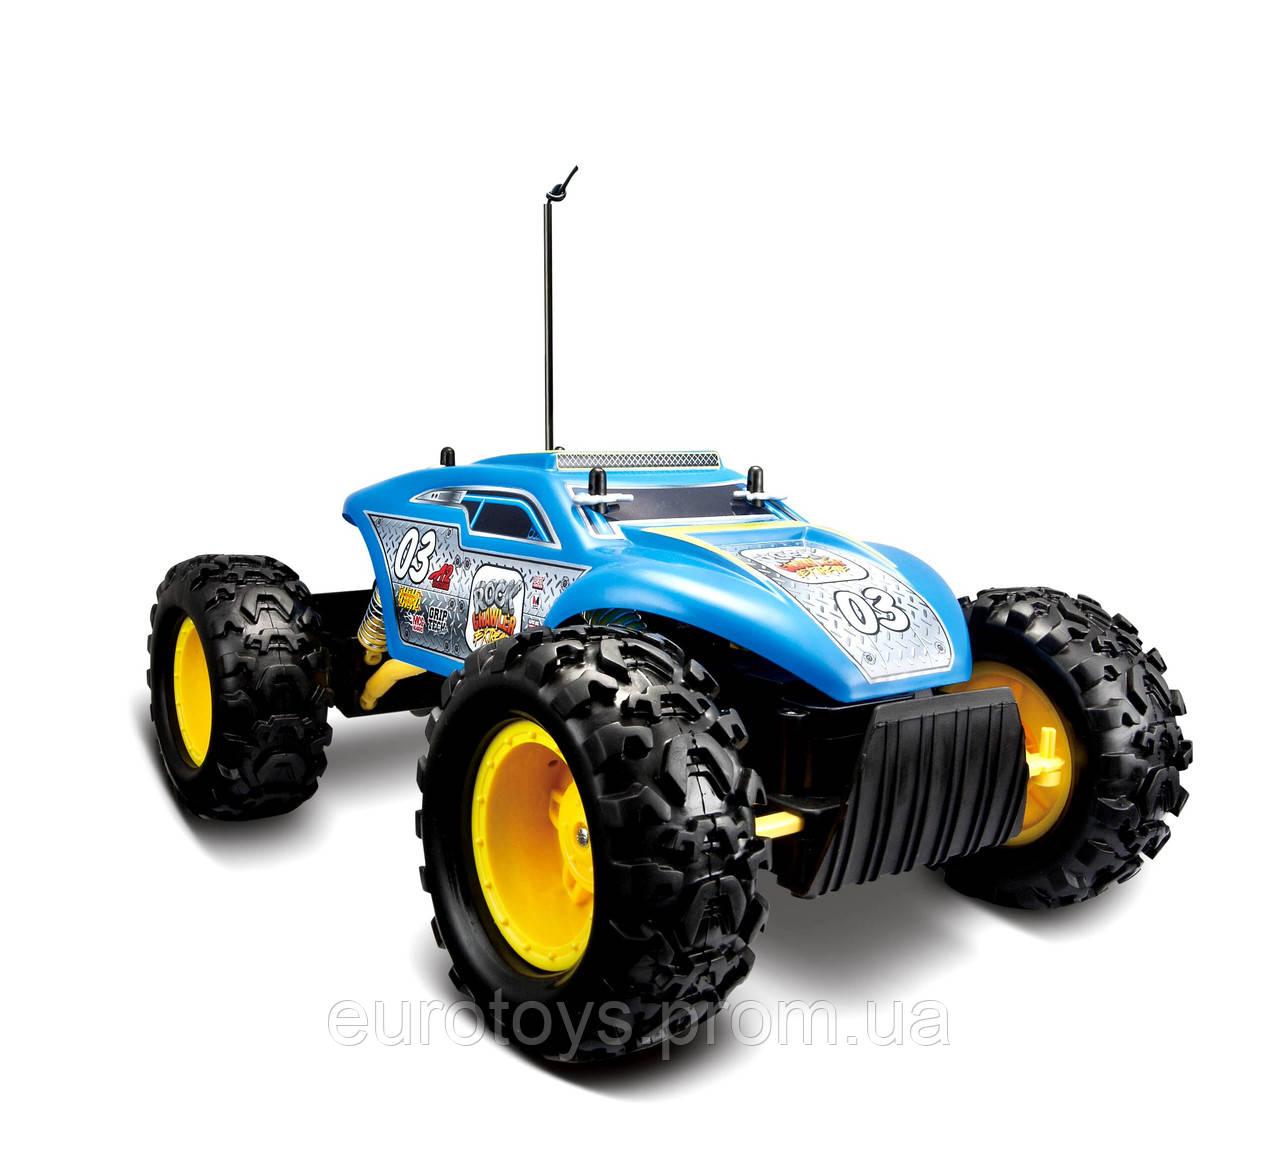 MAISTO TECH Автомодель  на р/у  Rock  Crawler Extreme синий  (81156)